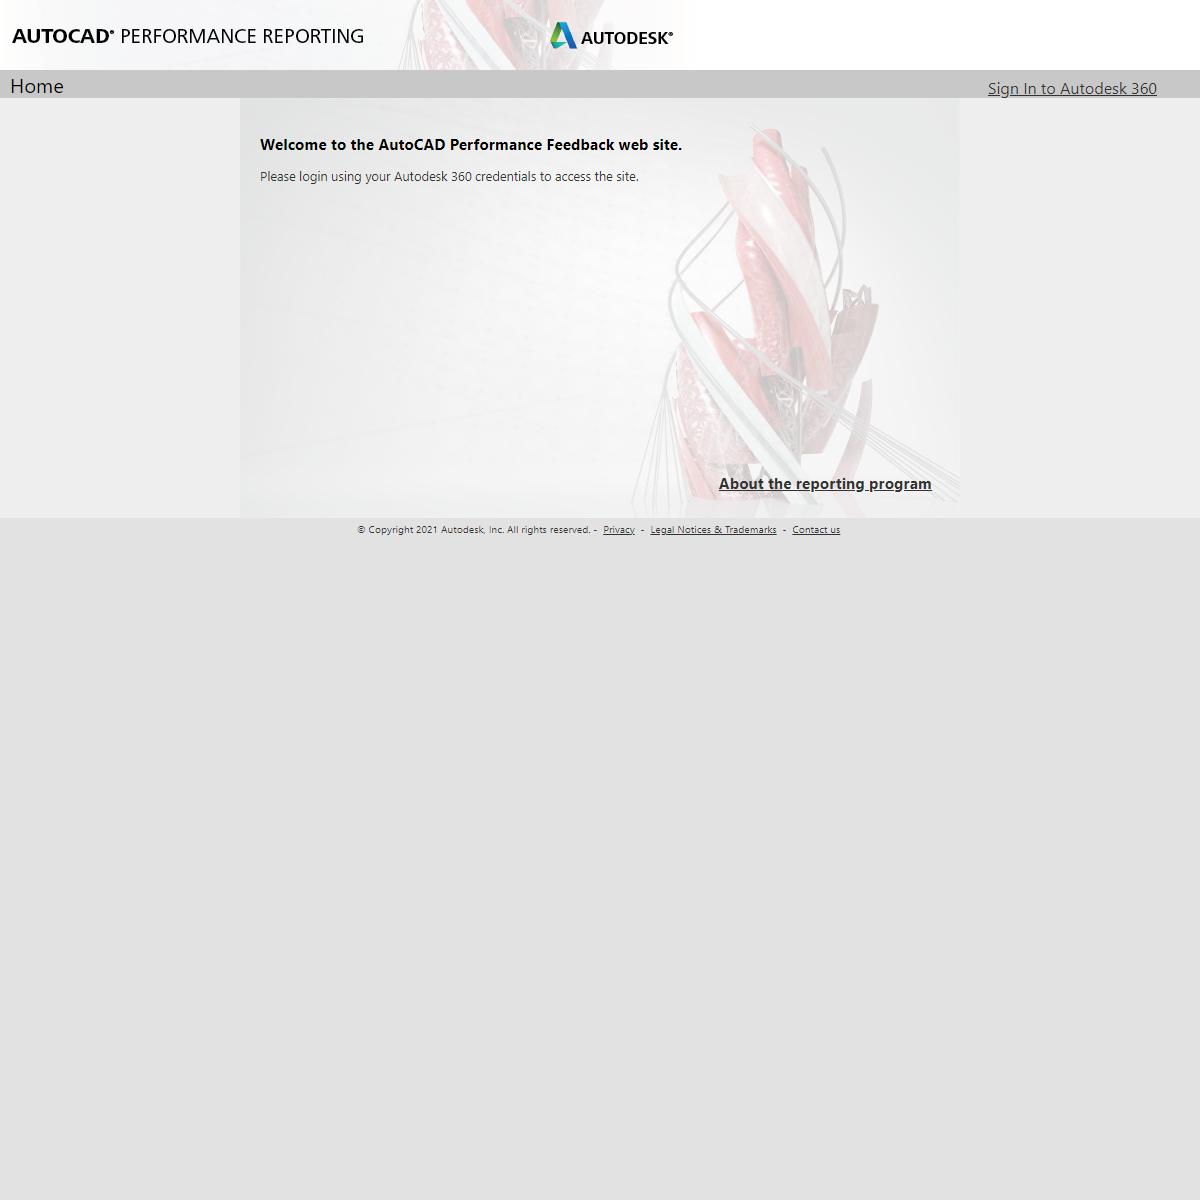 Home - AutoCAD Performance Problem Reporting Portal